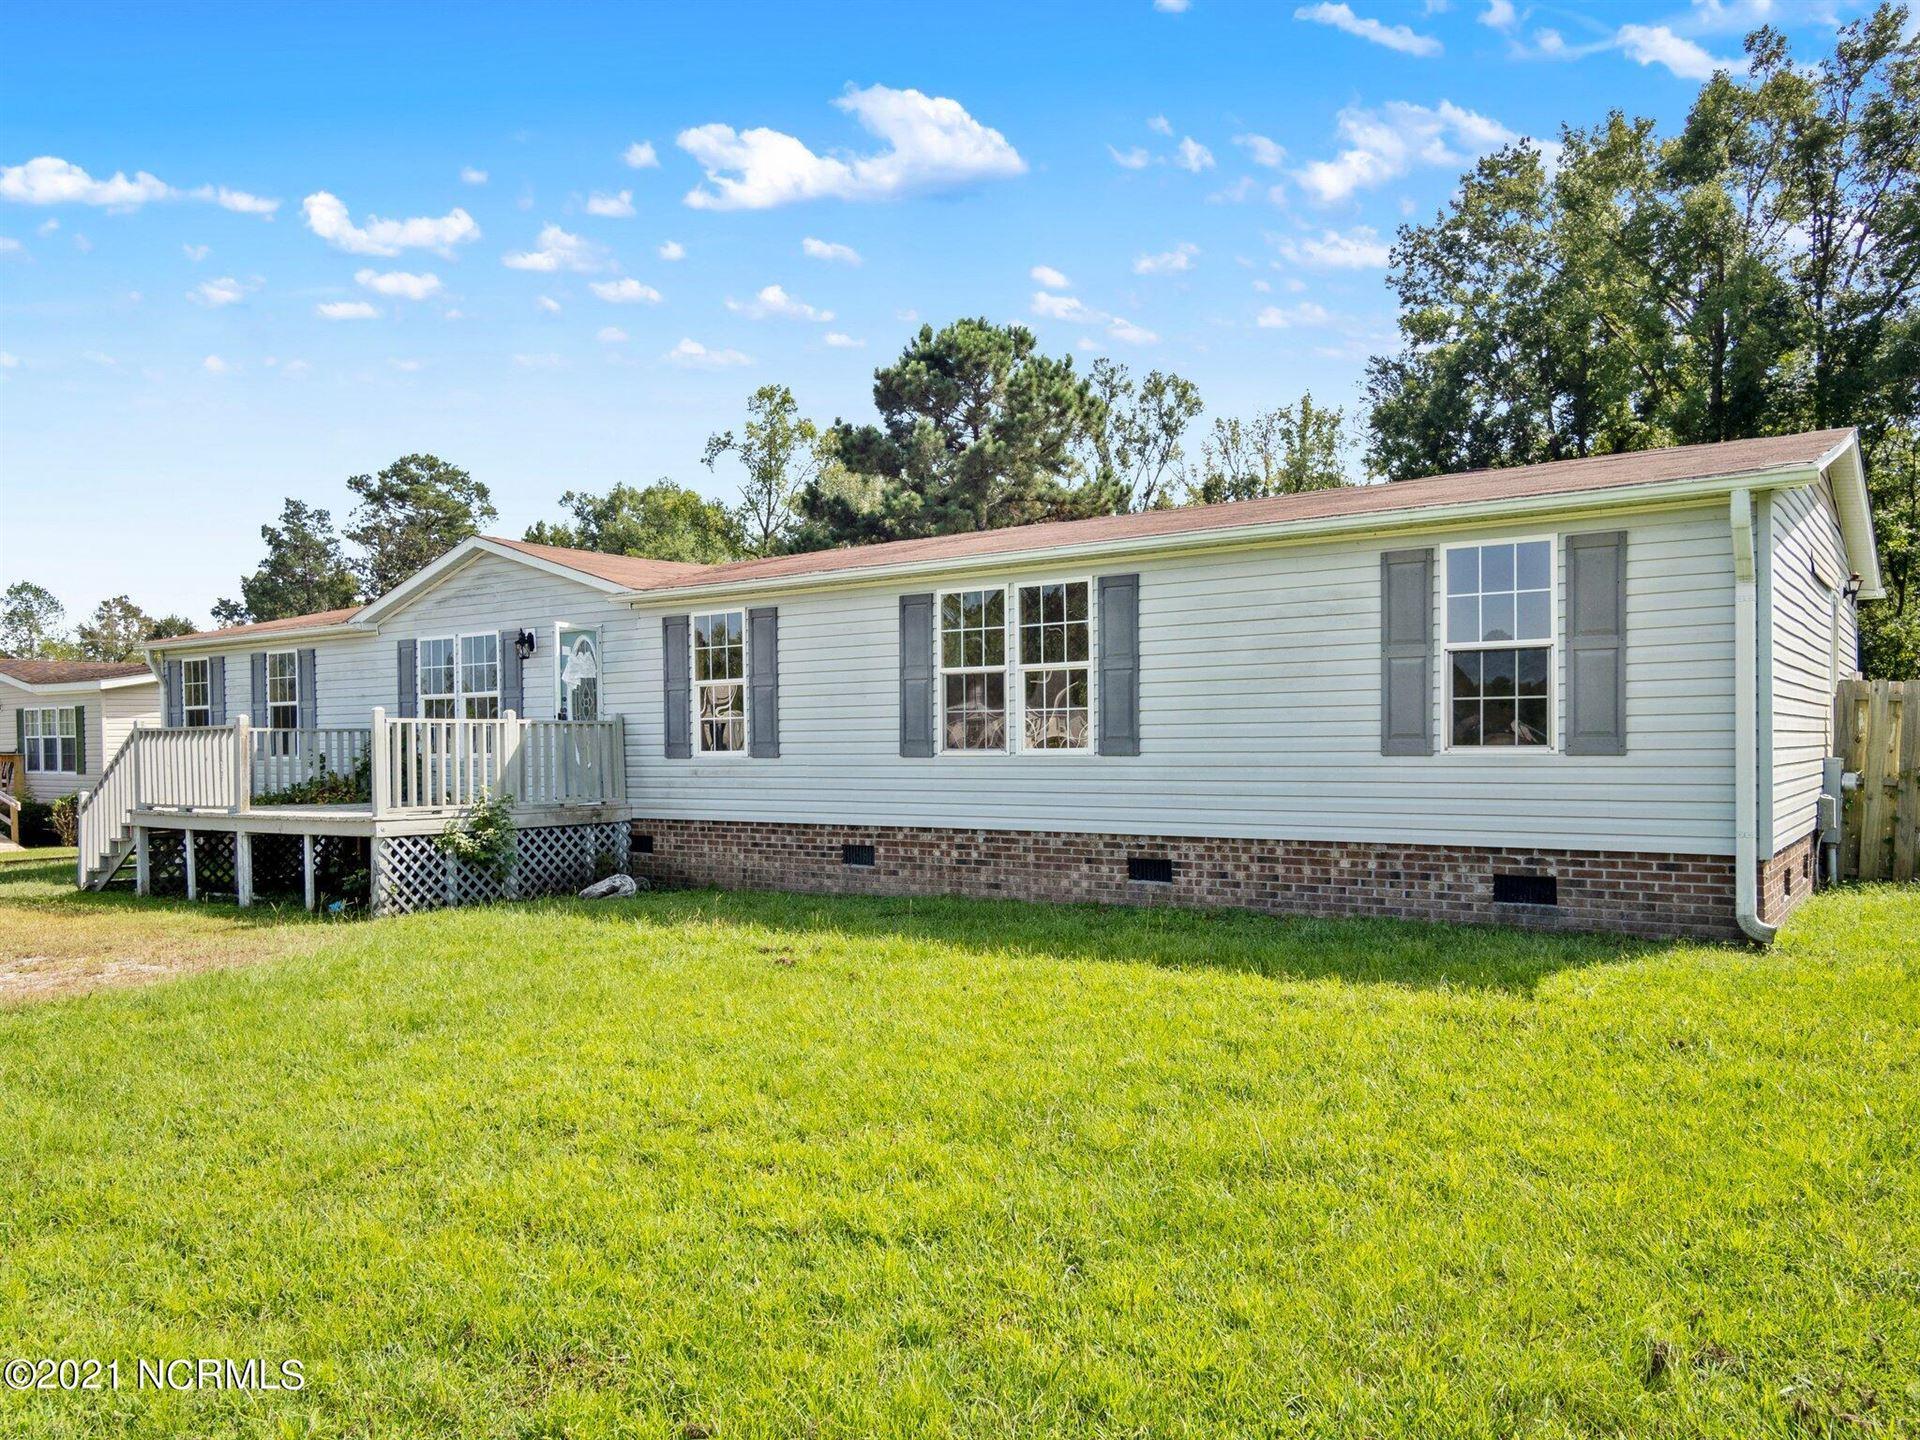 Photo of 105 Buckskin Drive, Maysville, NC 28555 (MLS # 100288948)